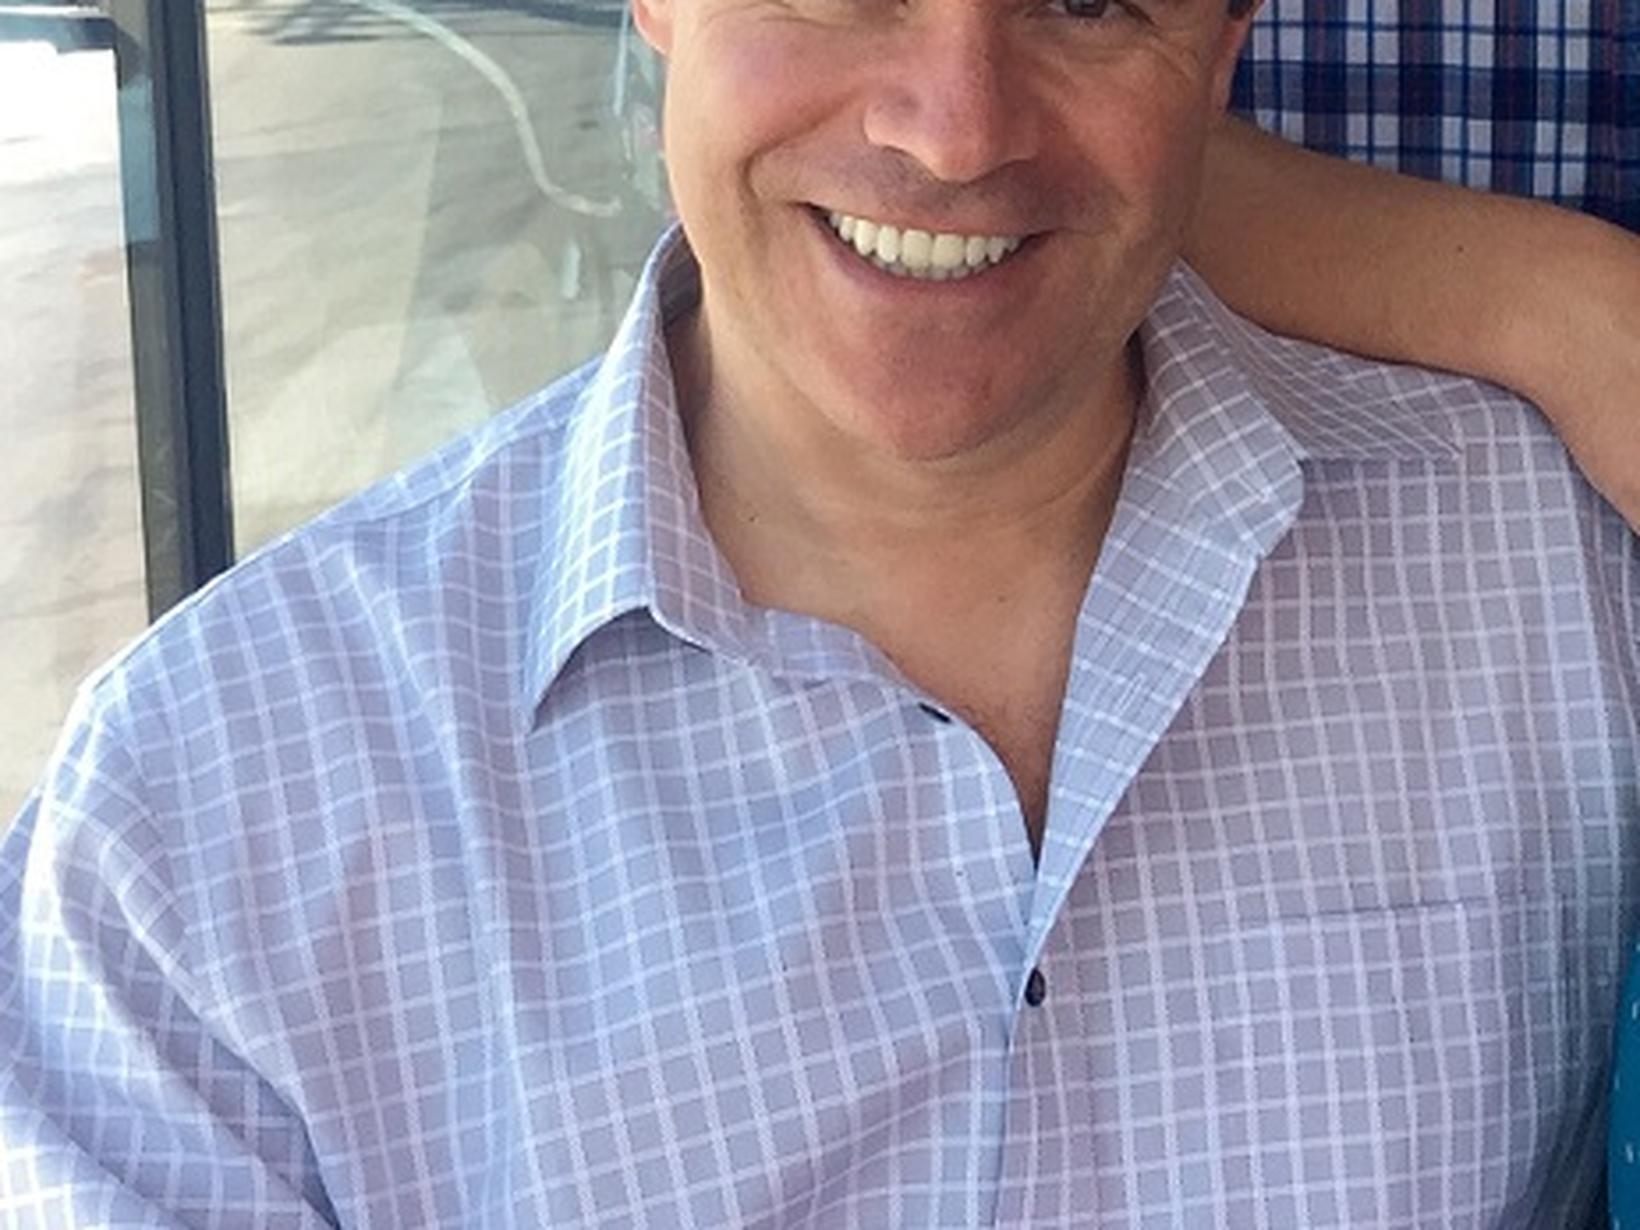 John from Manhattan Beach, California, United States